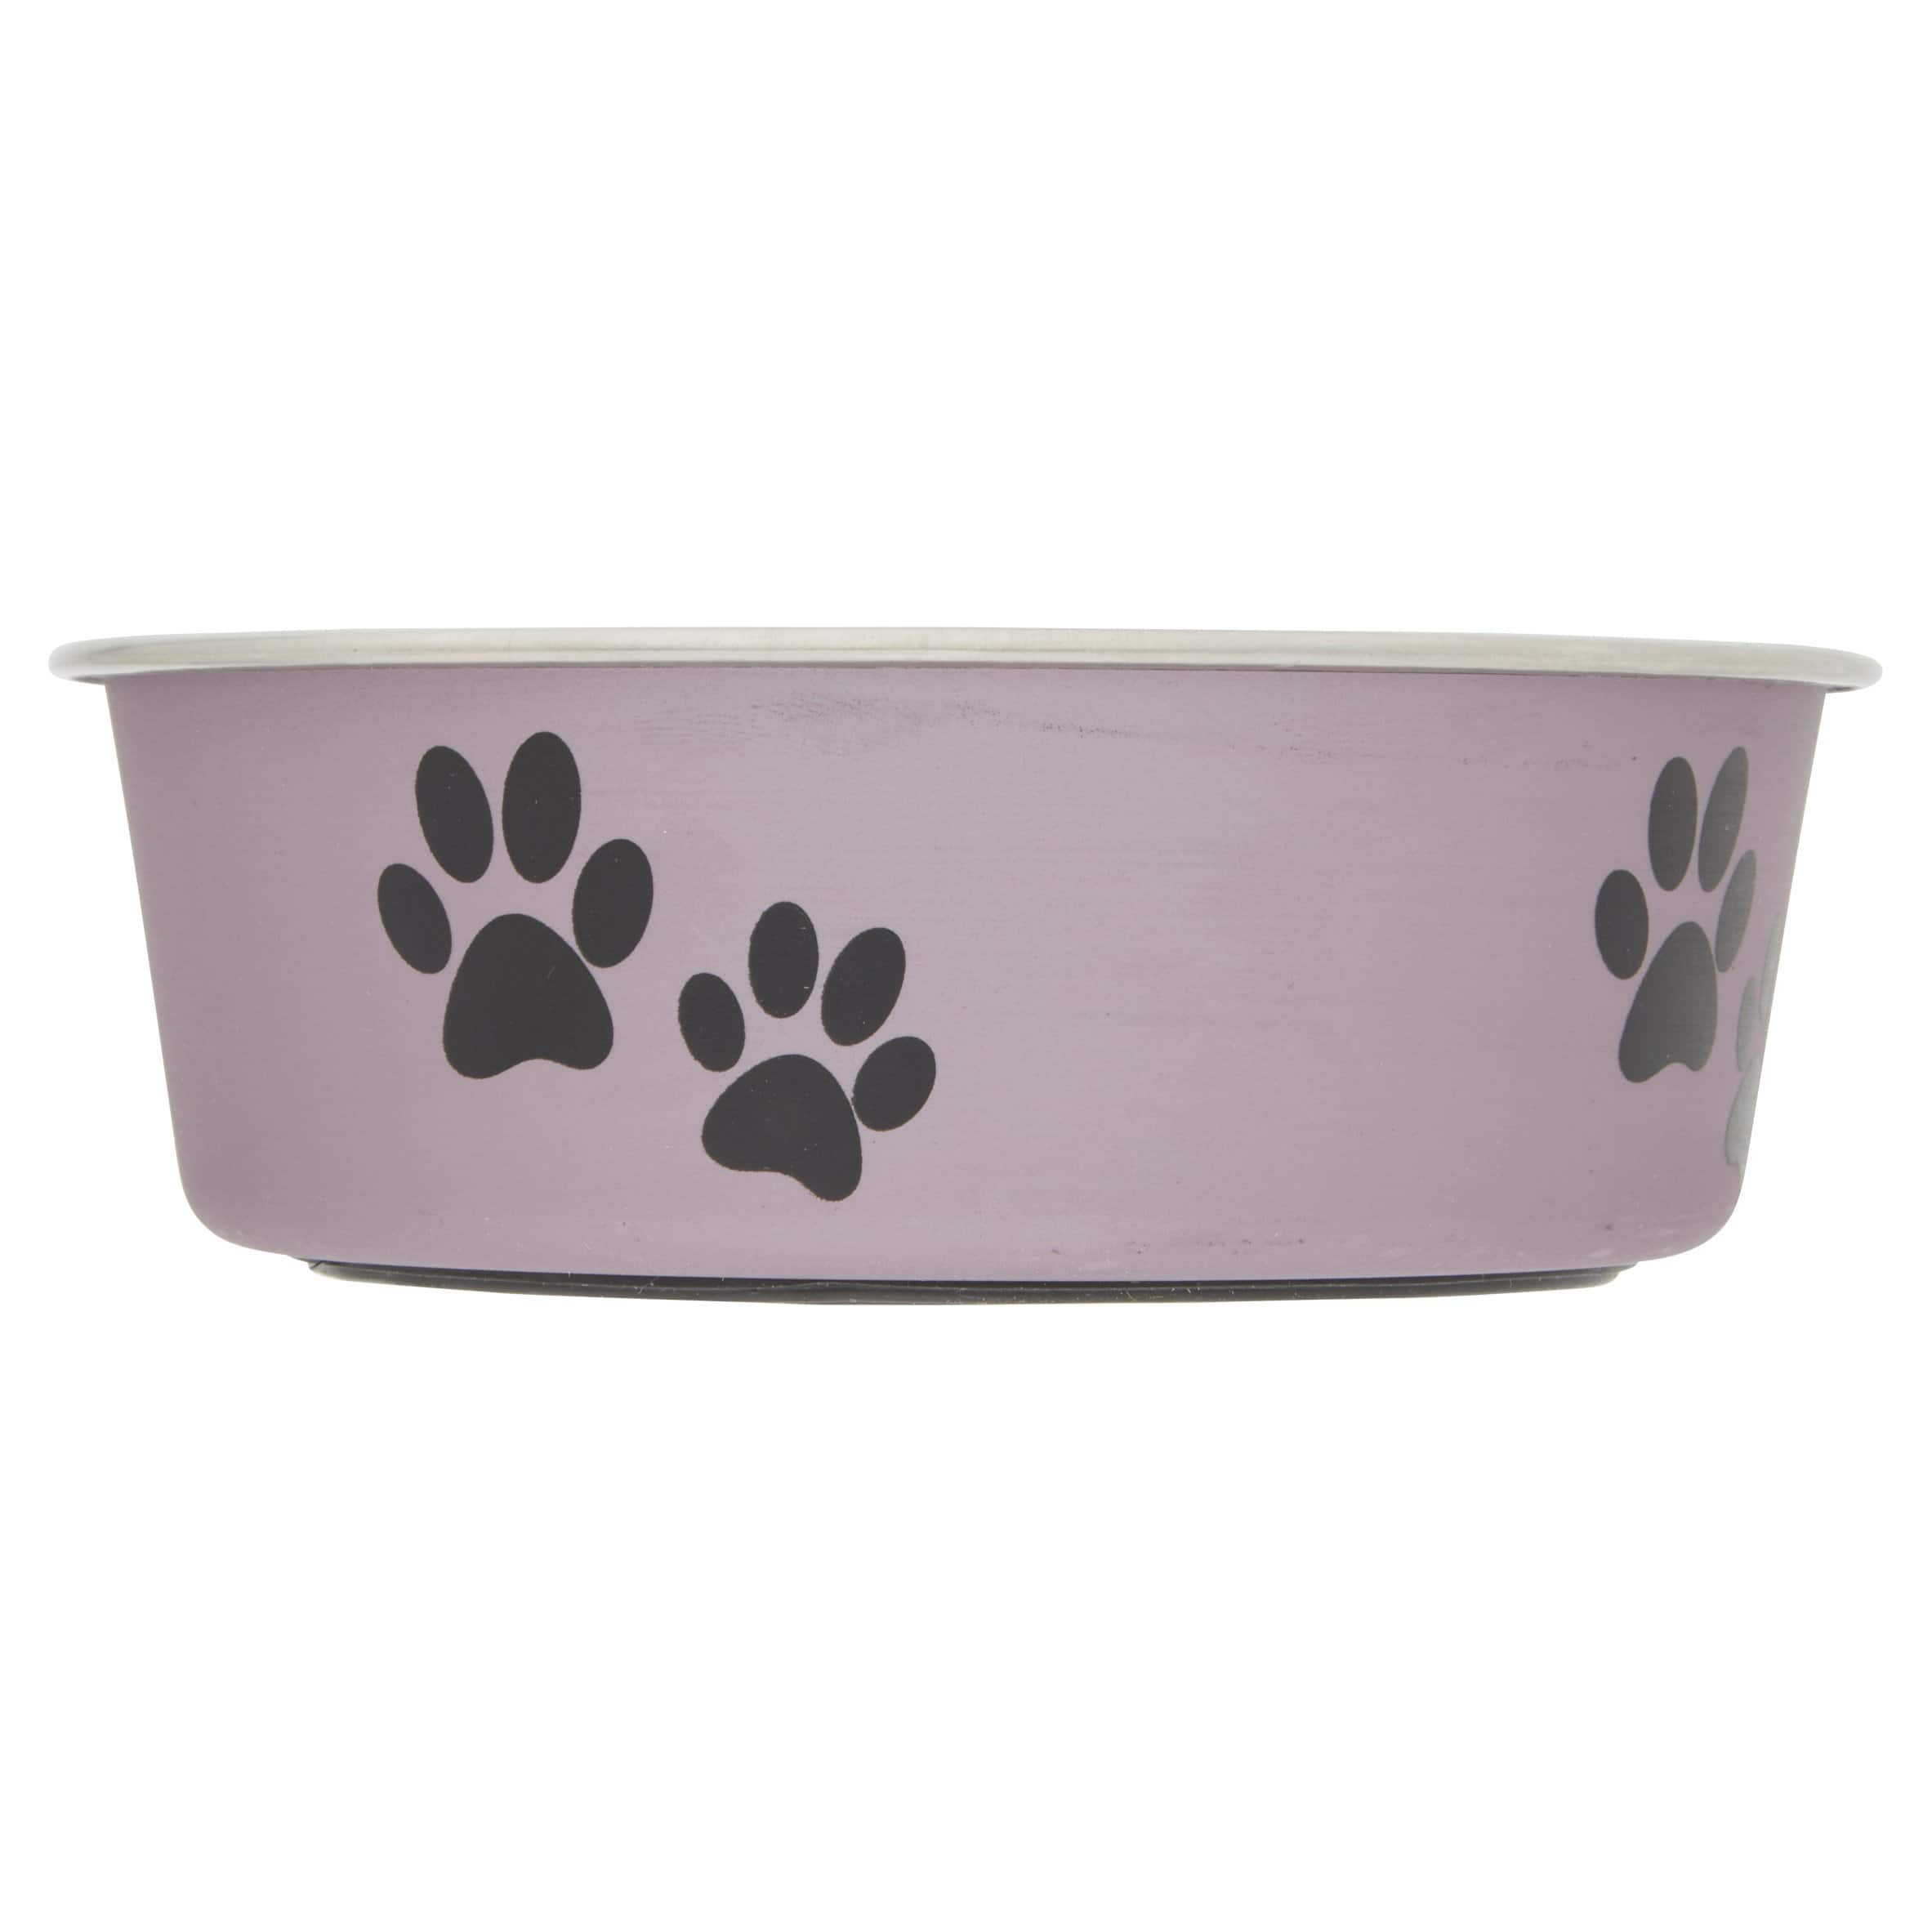 Loving Pets Metallic Bella Bowl (Small, Grape) $1.75 + Free Shipping w/ Prime